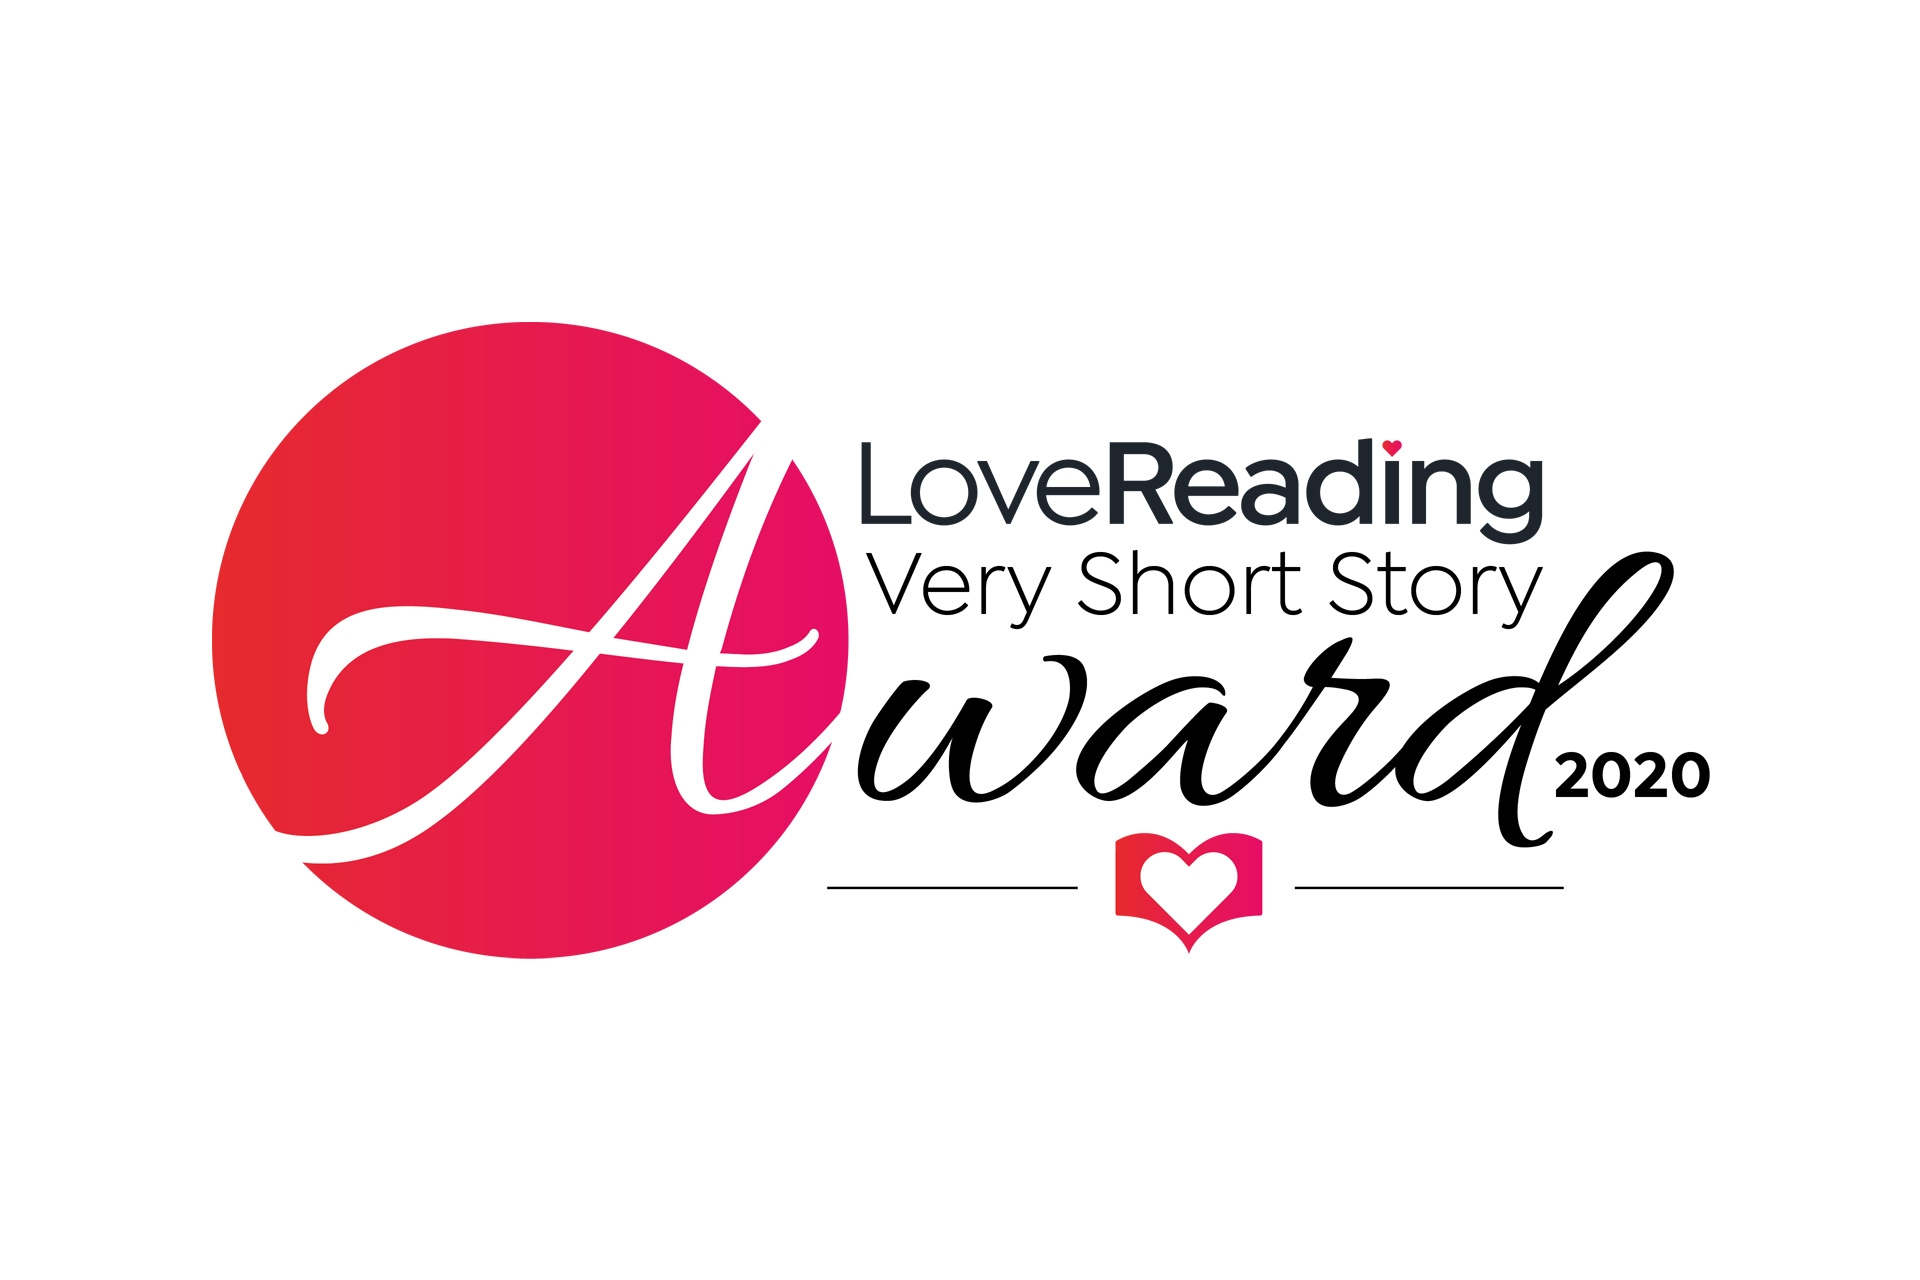 The LoveReading Very Short Story Award